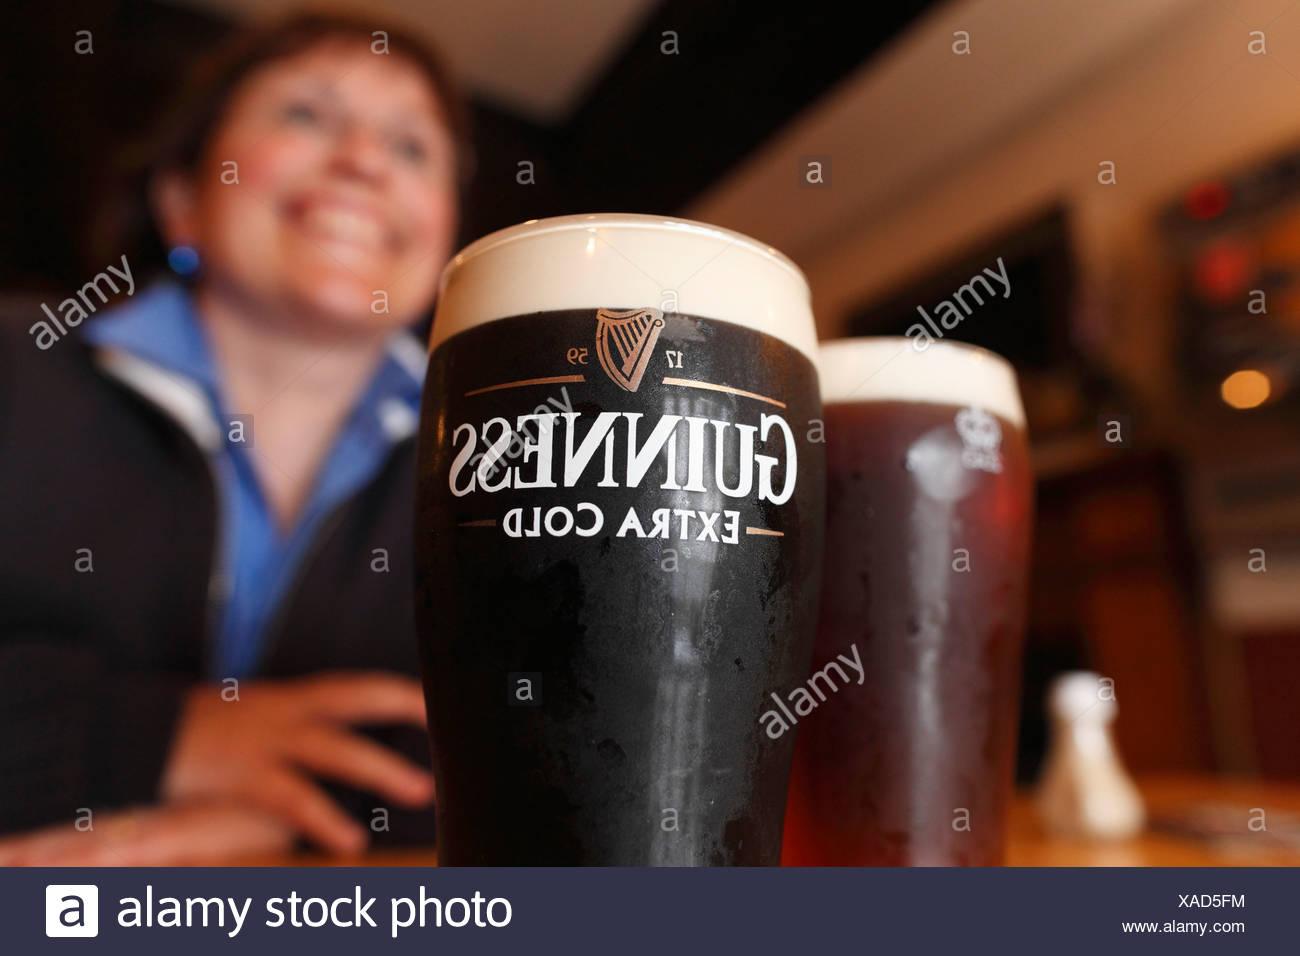 Pint of Guinness, stout beer, Mary McBride's Pub, Cushendun, County Antrim, Northern Ireland, United Kingdom, Europe - Stock Image